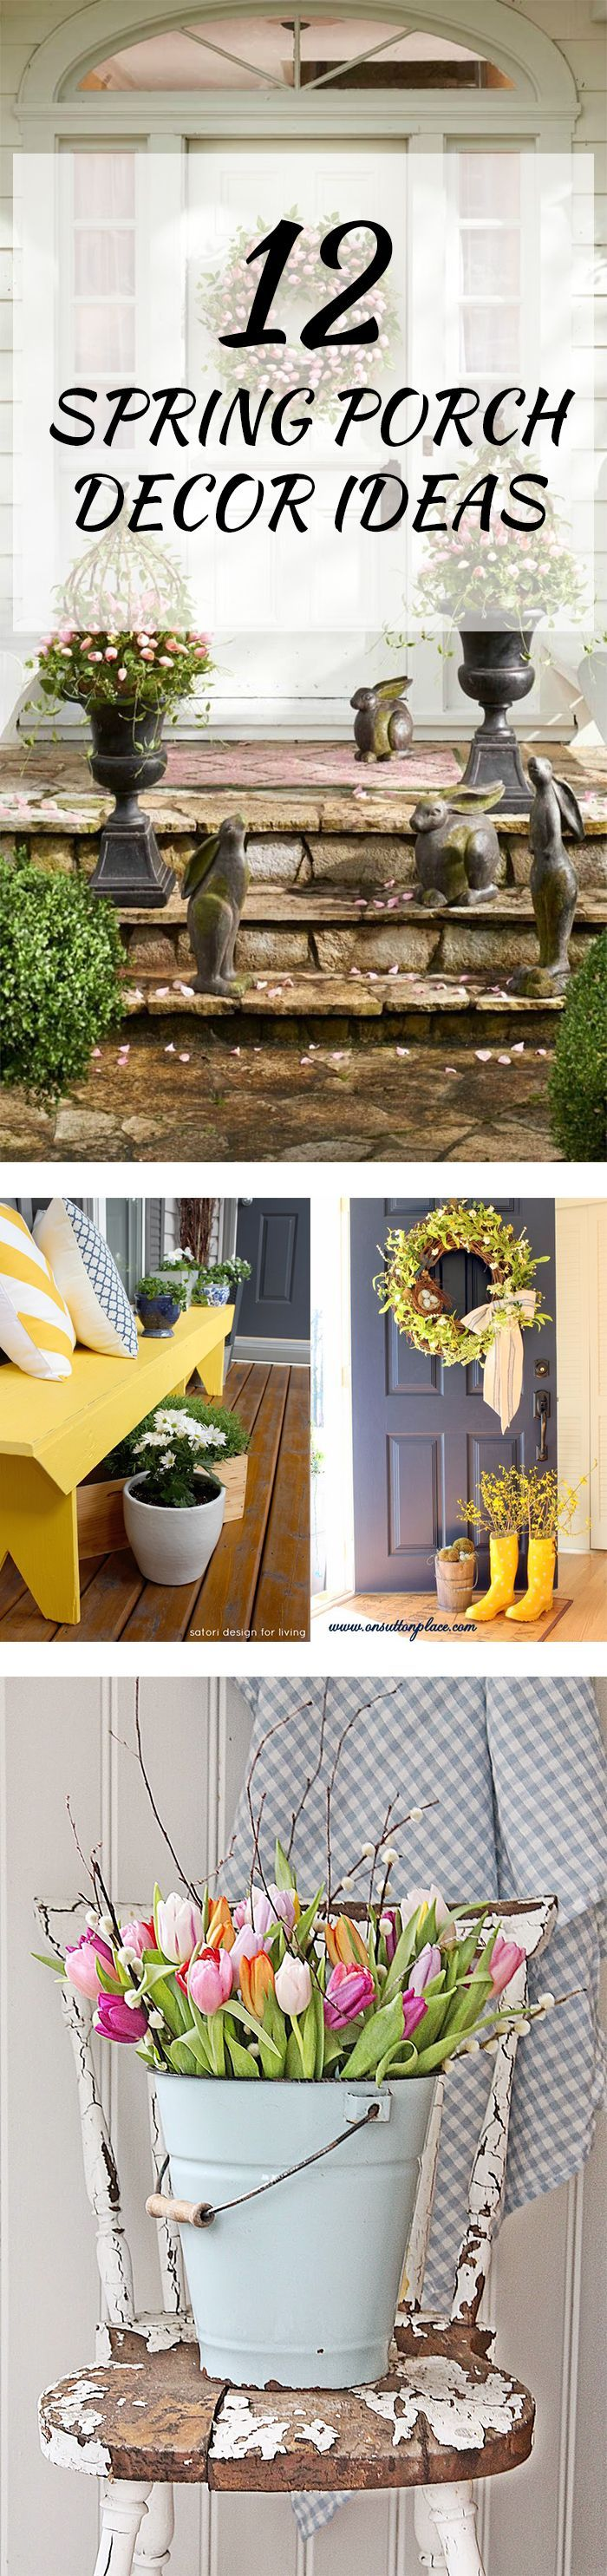 22 fall front porch ideas veranda home stories a to z - 12 Spring Porch Decor Ideas